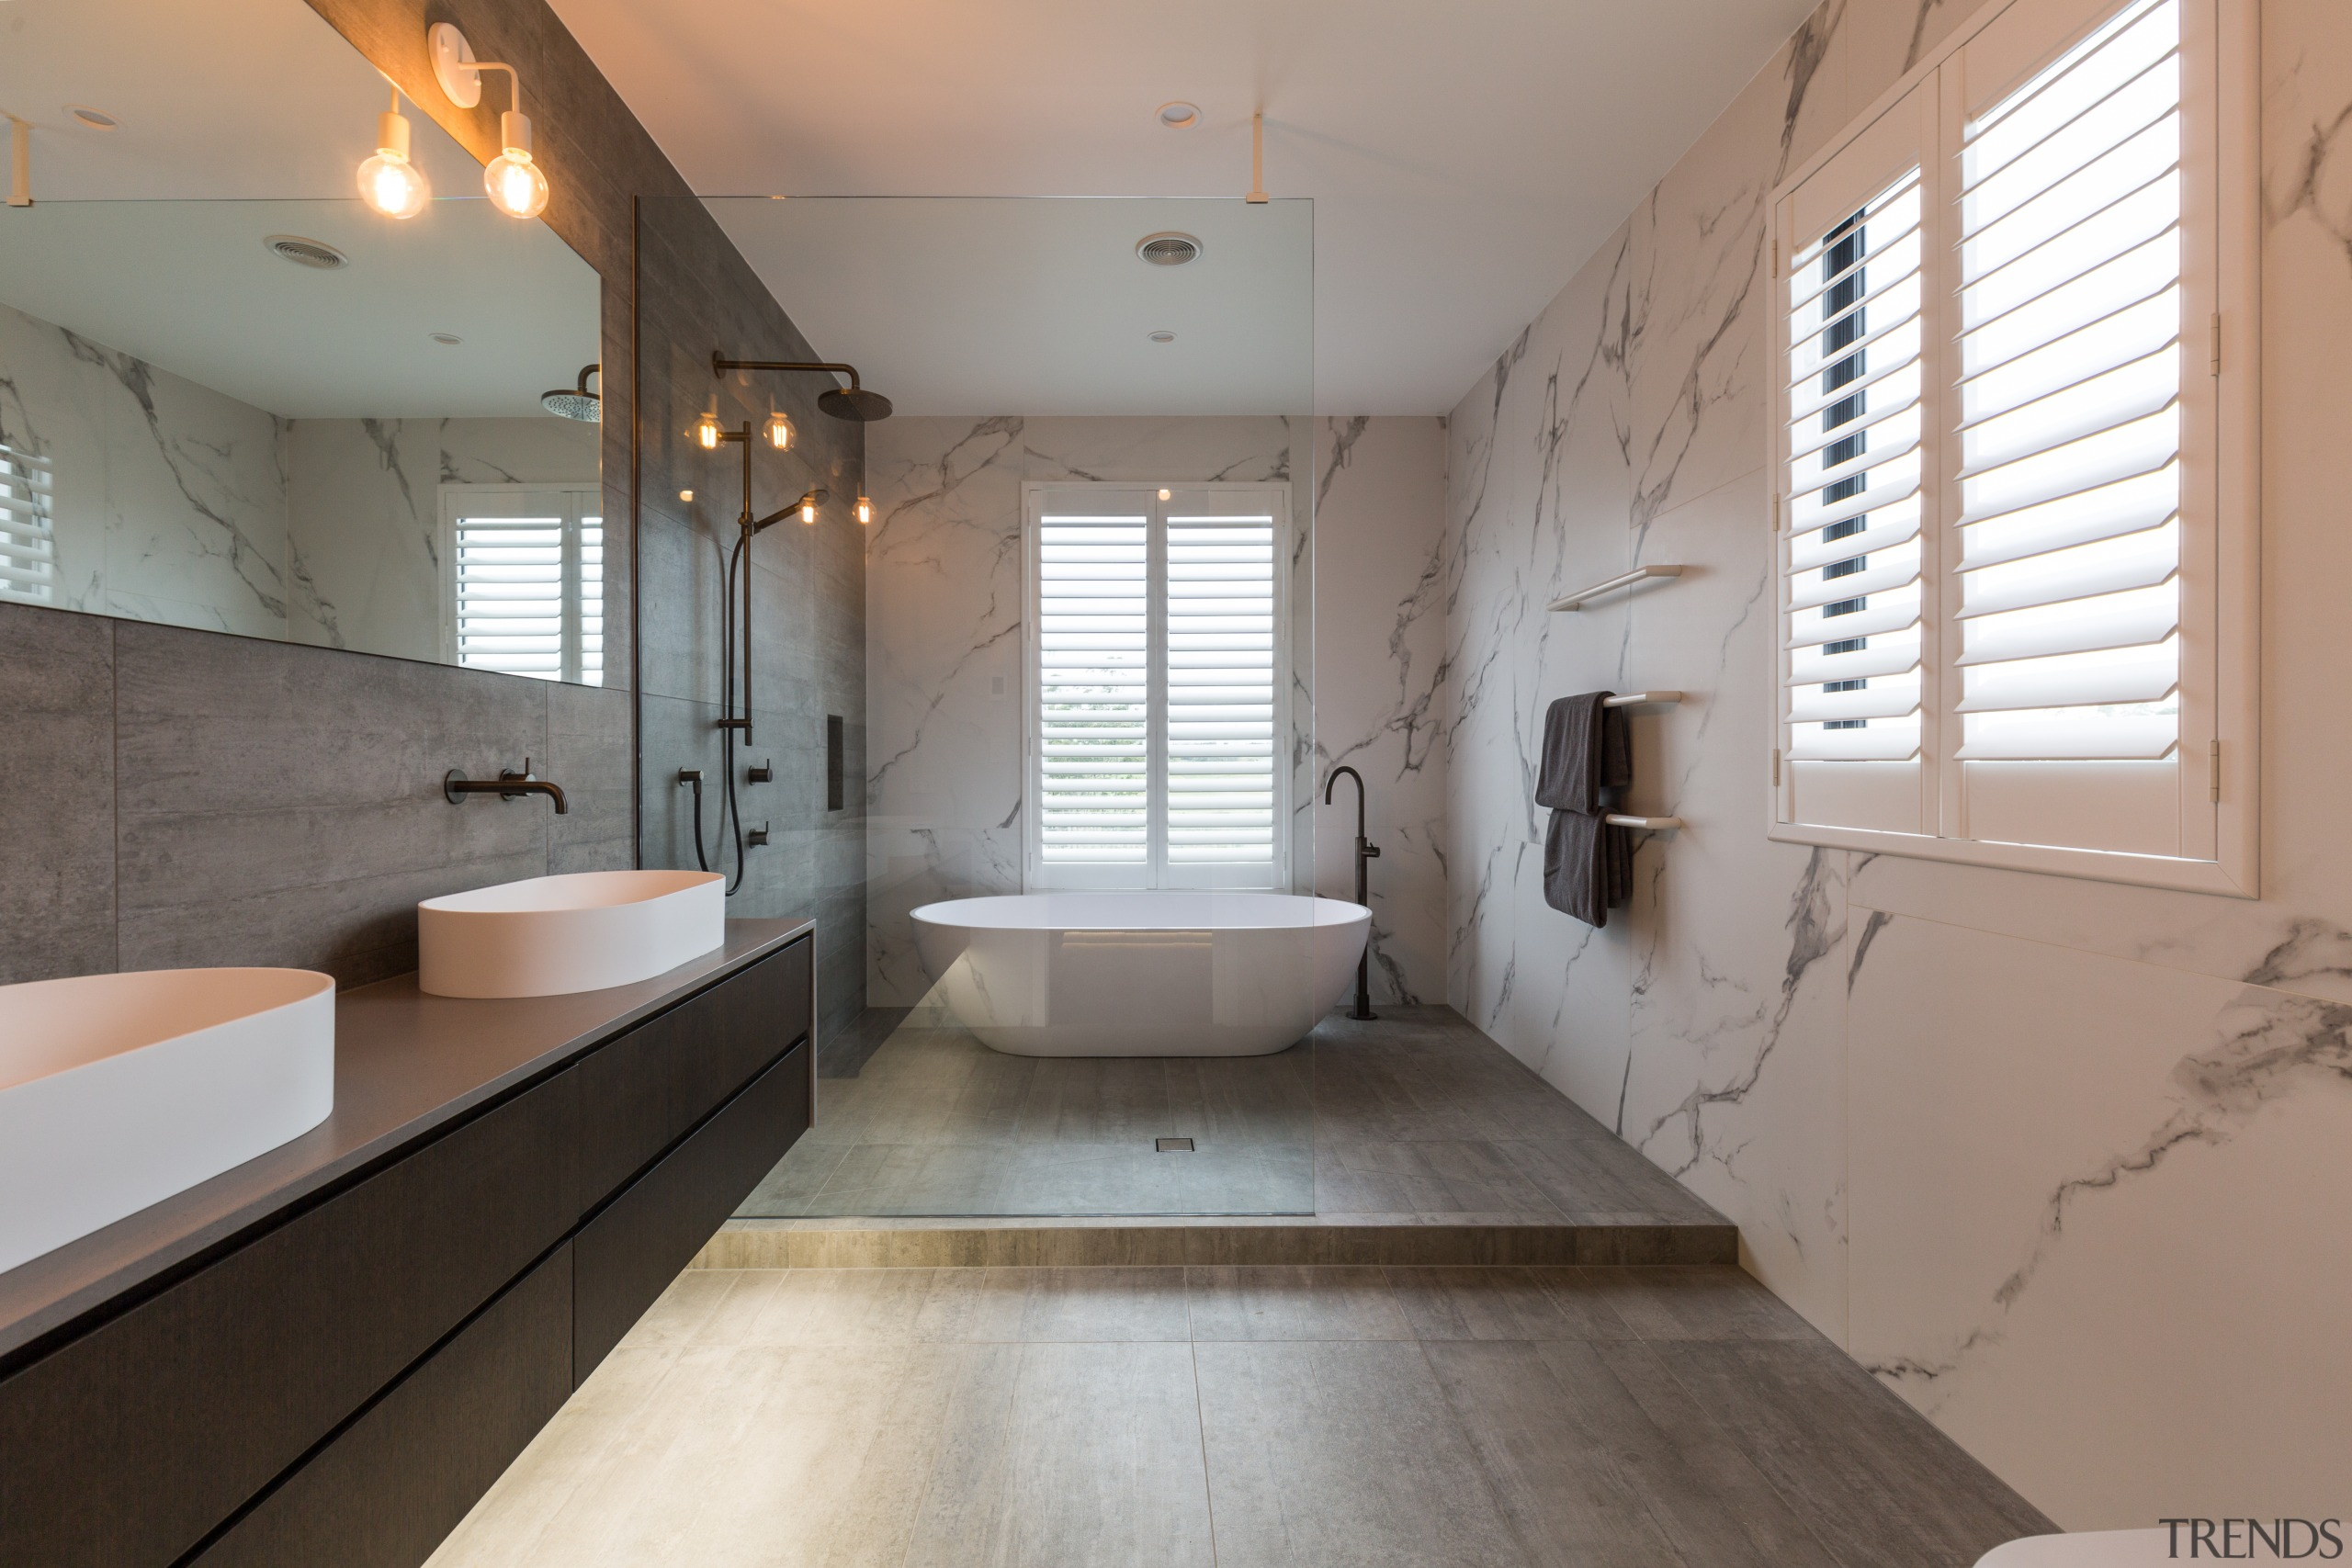 The bathroom has an open, walk-in wet area architecture, bathroom, floor, interior design, room, gray